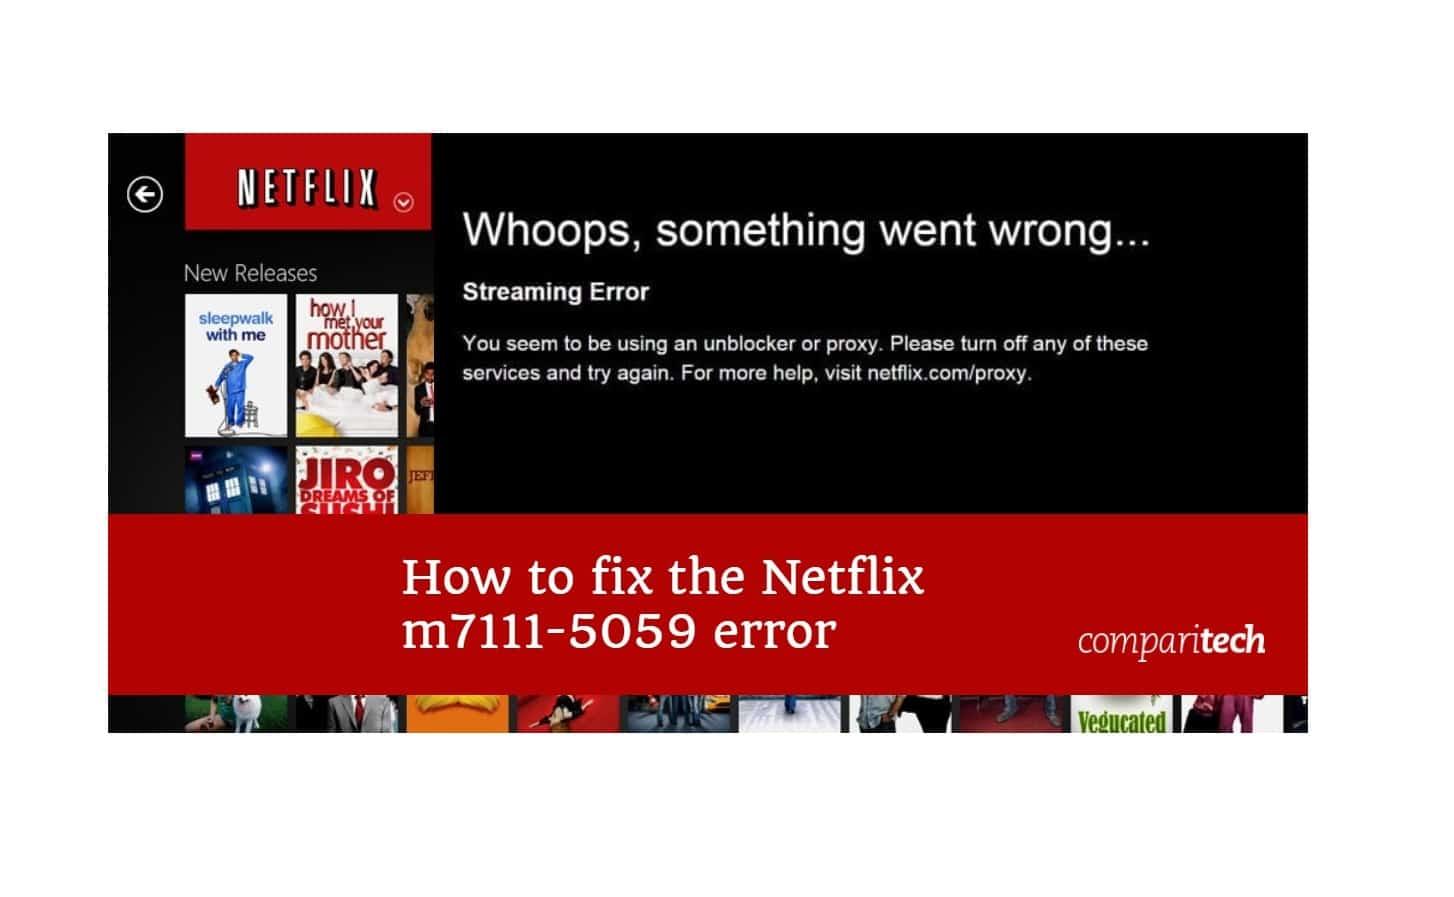 Fix Netflix Error Code m7111-1331-5059 (using a Unblocker or Proxy)